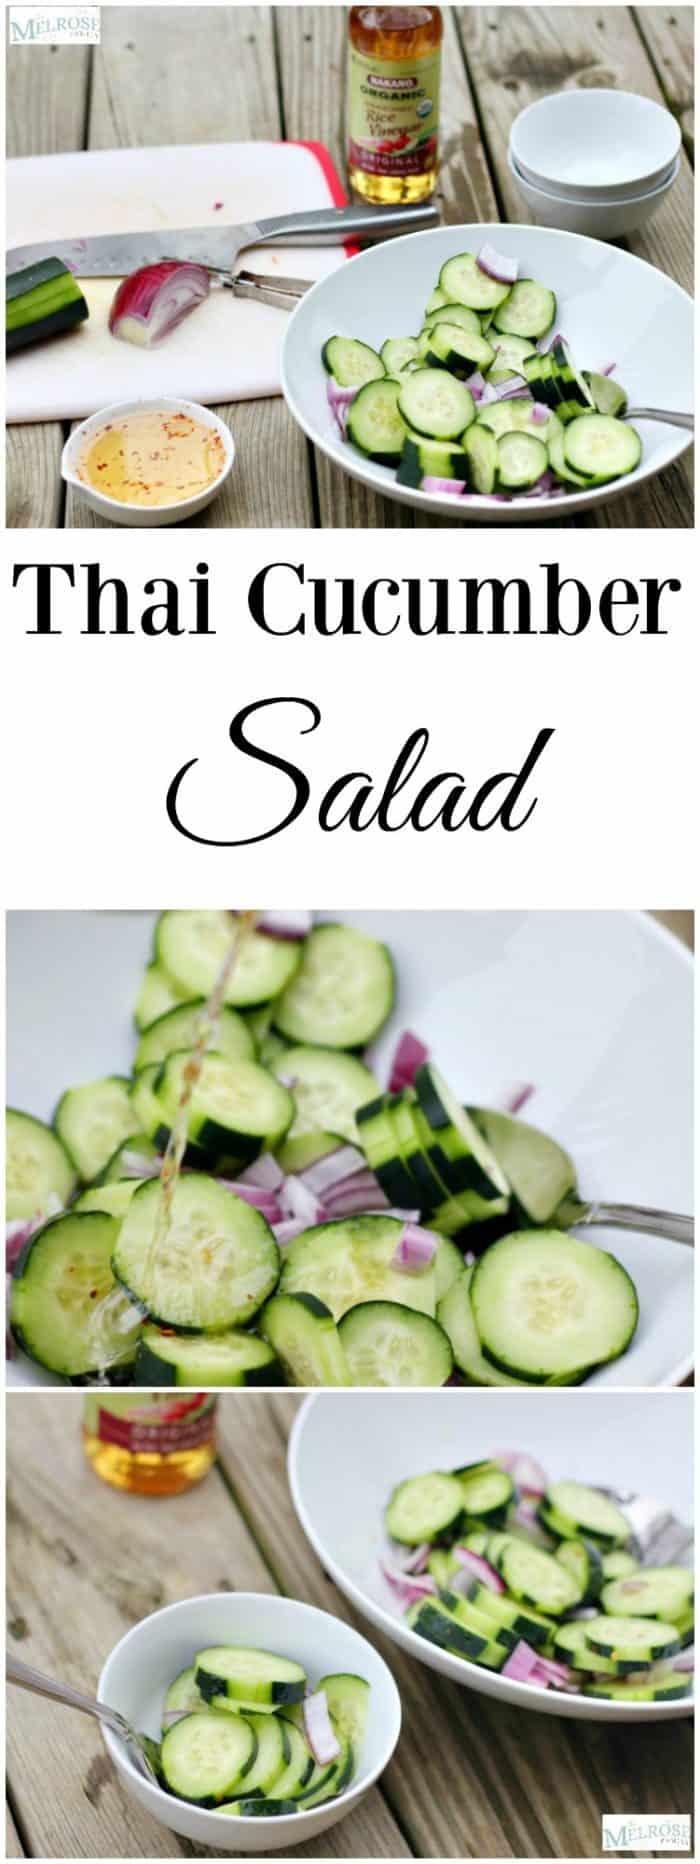 Thai Cucumber Salad on a plate